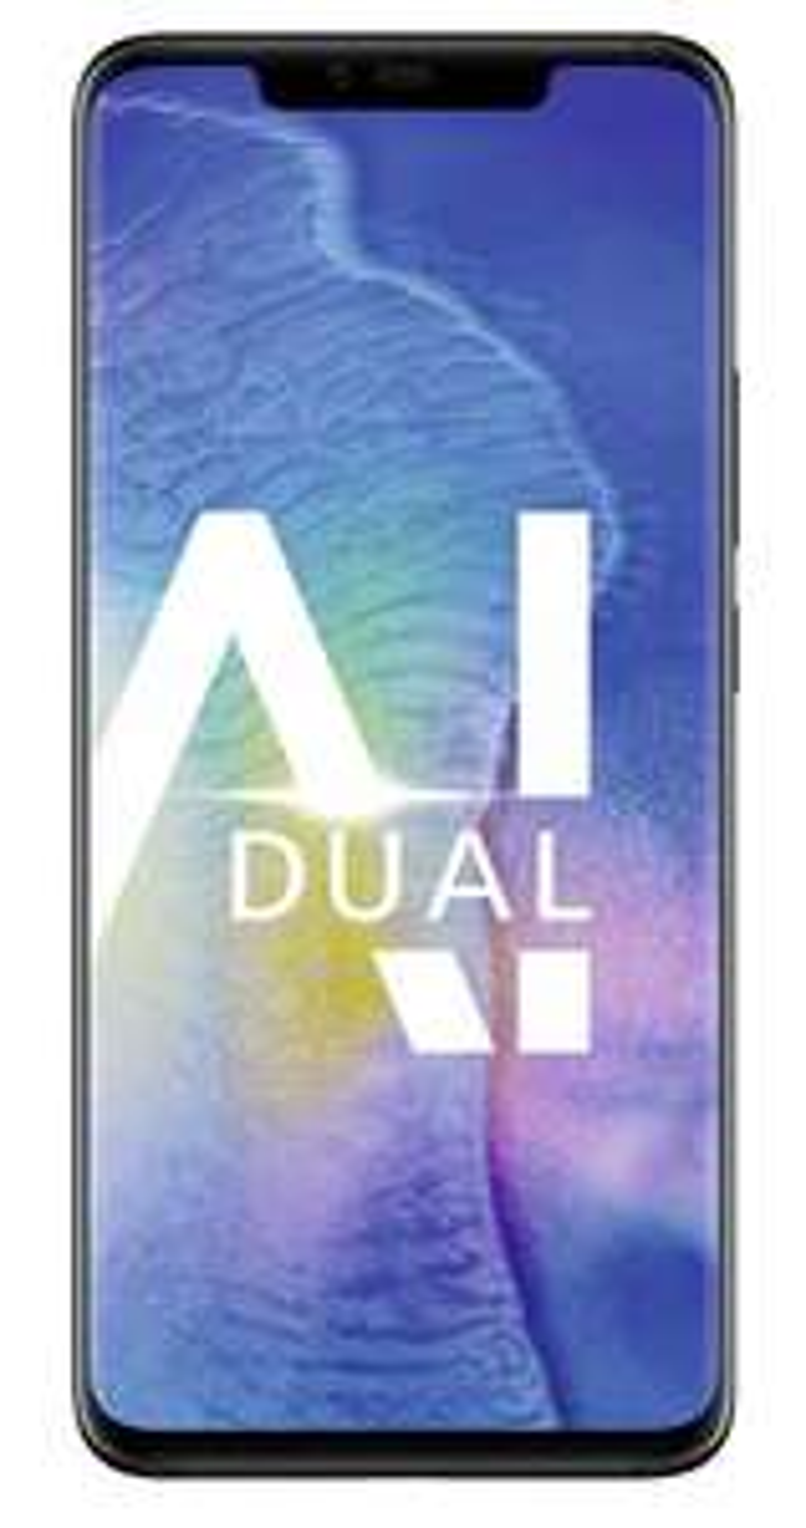 "Huawei Mate 20 Pro, 6,39"" OLED, 128GB/6GB, Dual-Sim, 4.200 mAh, Leica Triple Kamera, USB-C, Android 9.0, in Schwarz oder Blau"